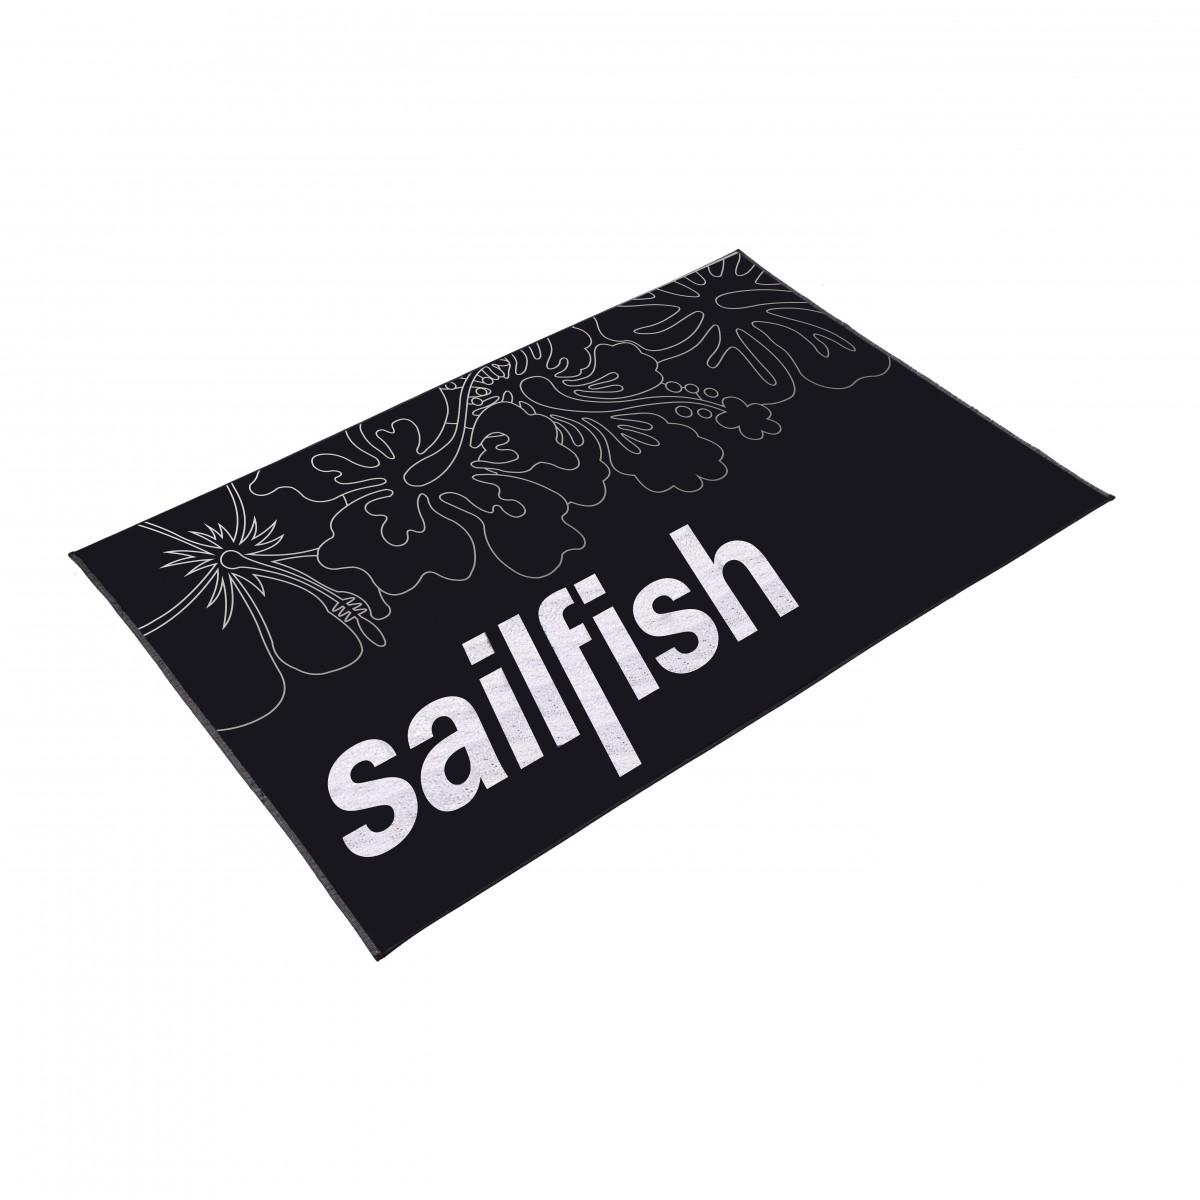 sailfish beach towel handtuch ebay. Black Bedroom Furniture Sets. Home Design Ideas